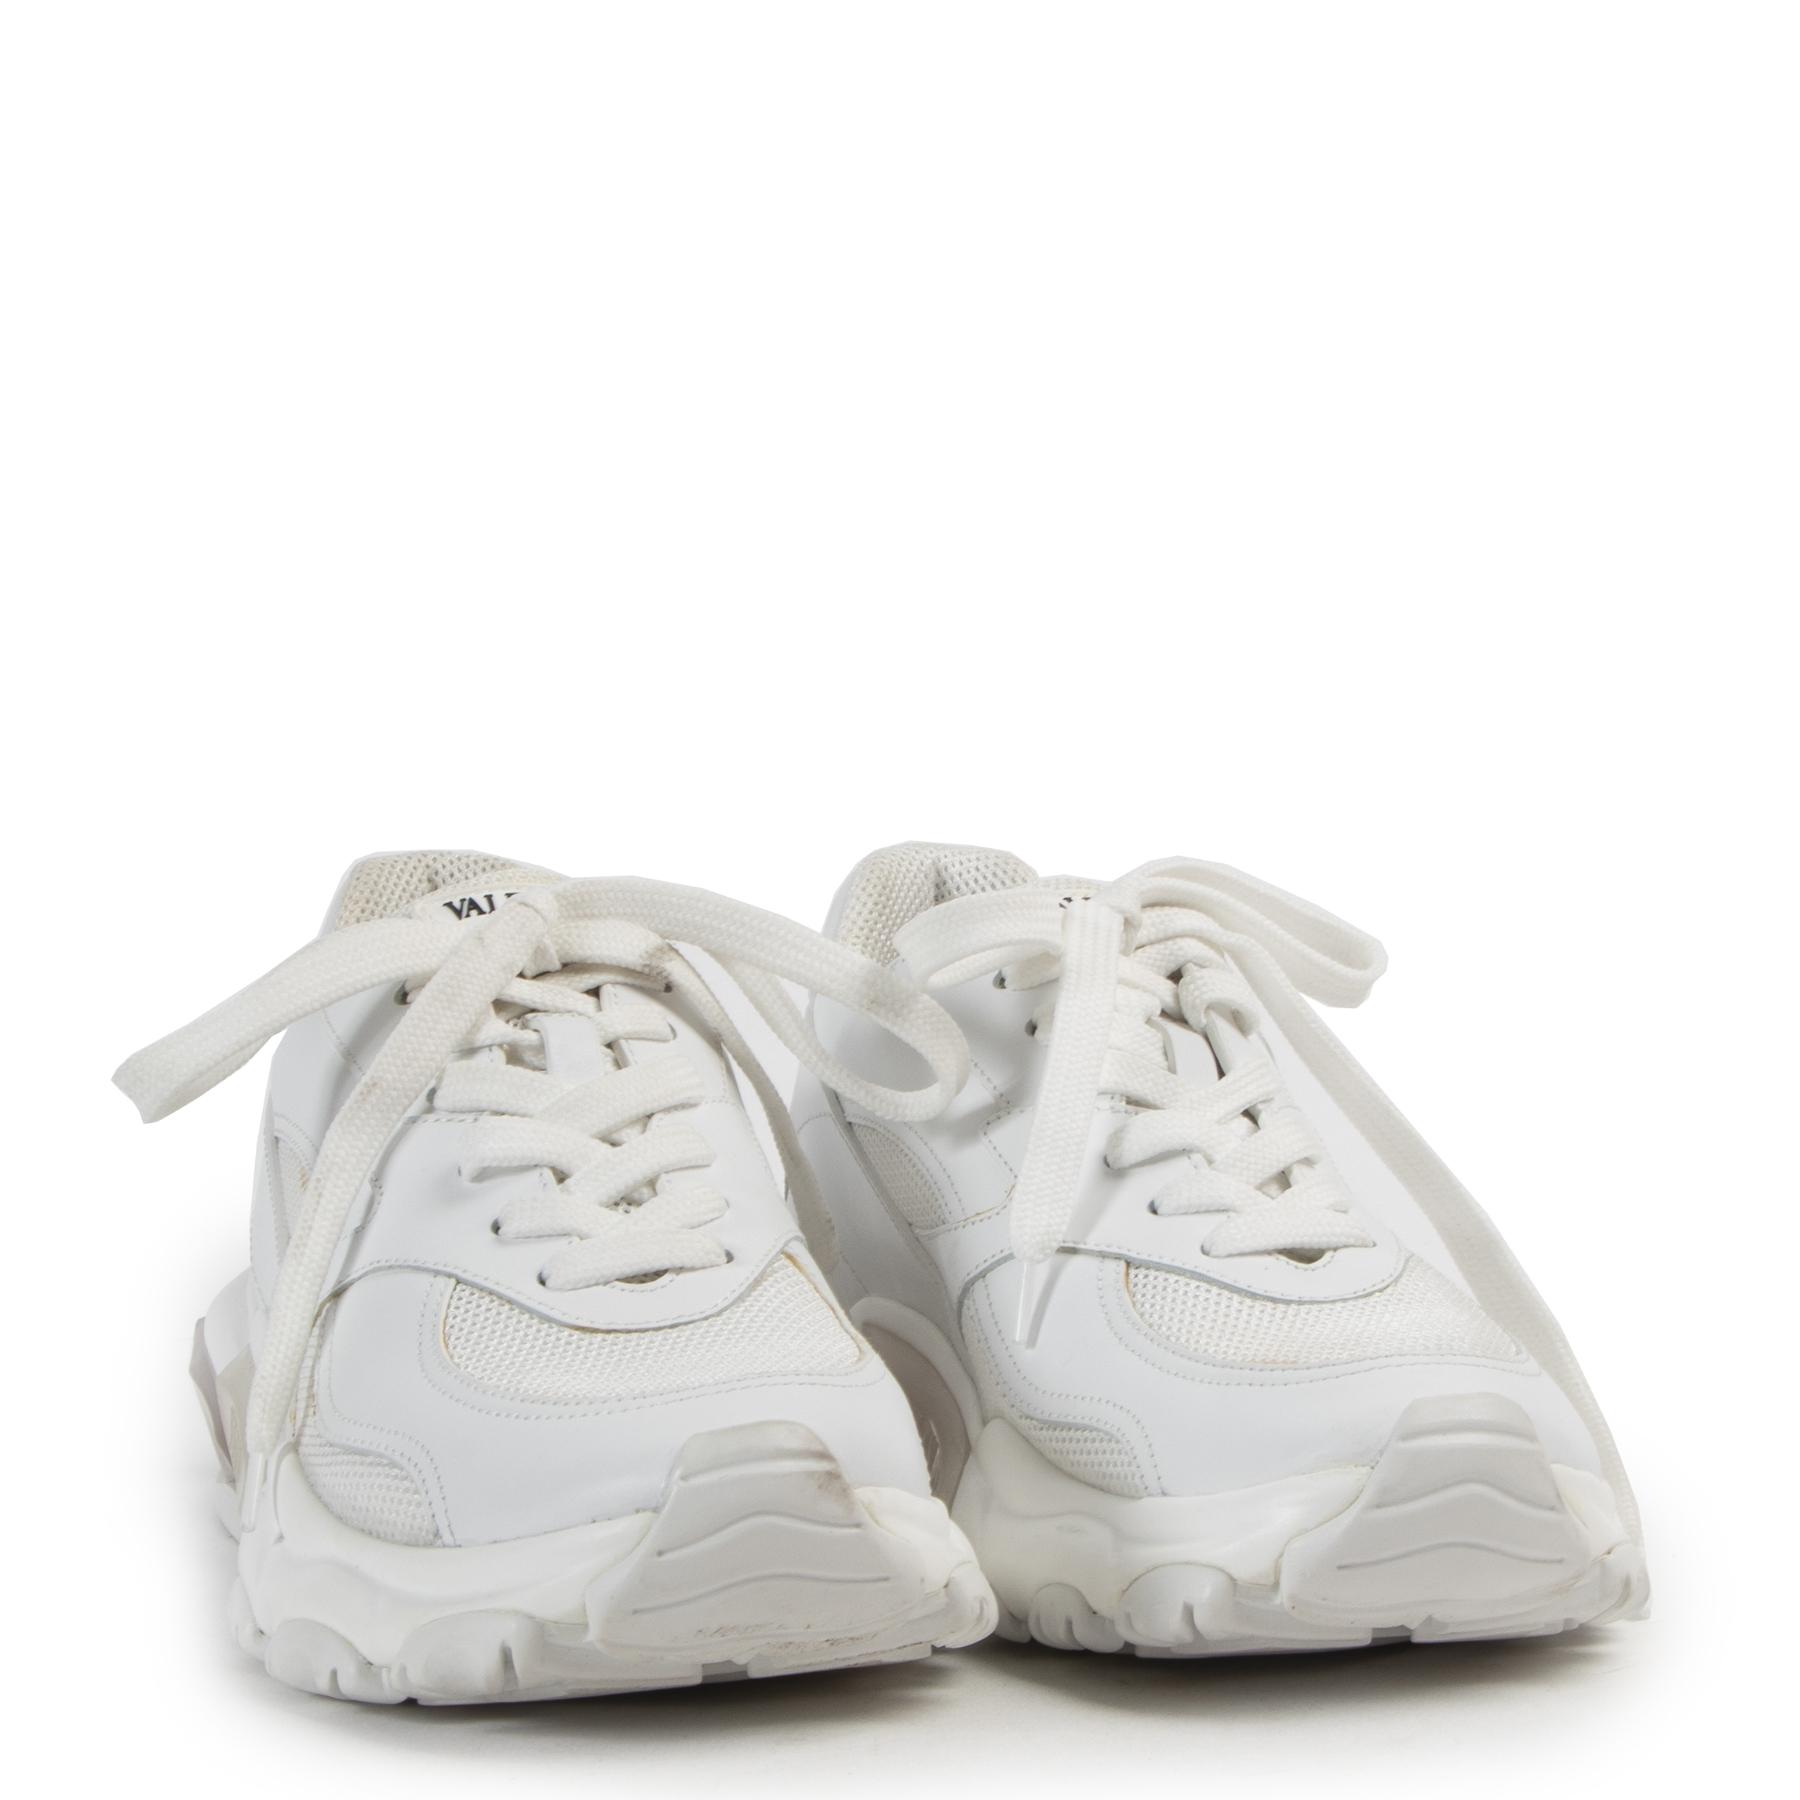 acheter en ligne seconde main Valentino Garavani Bounce Low-Top Sneaker - size 37,5